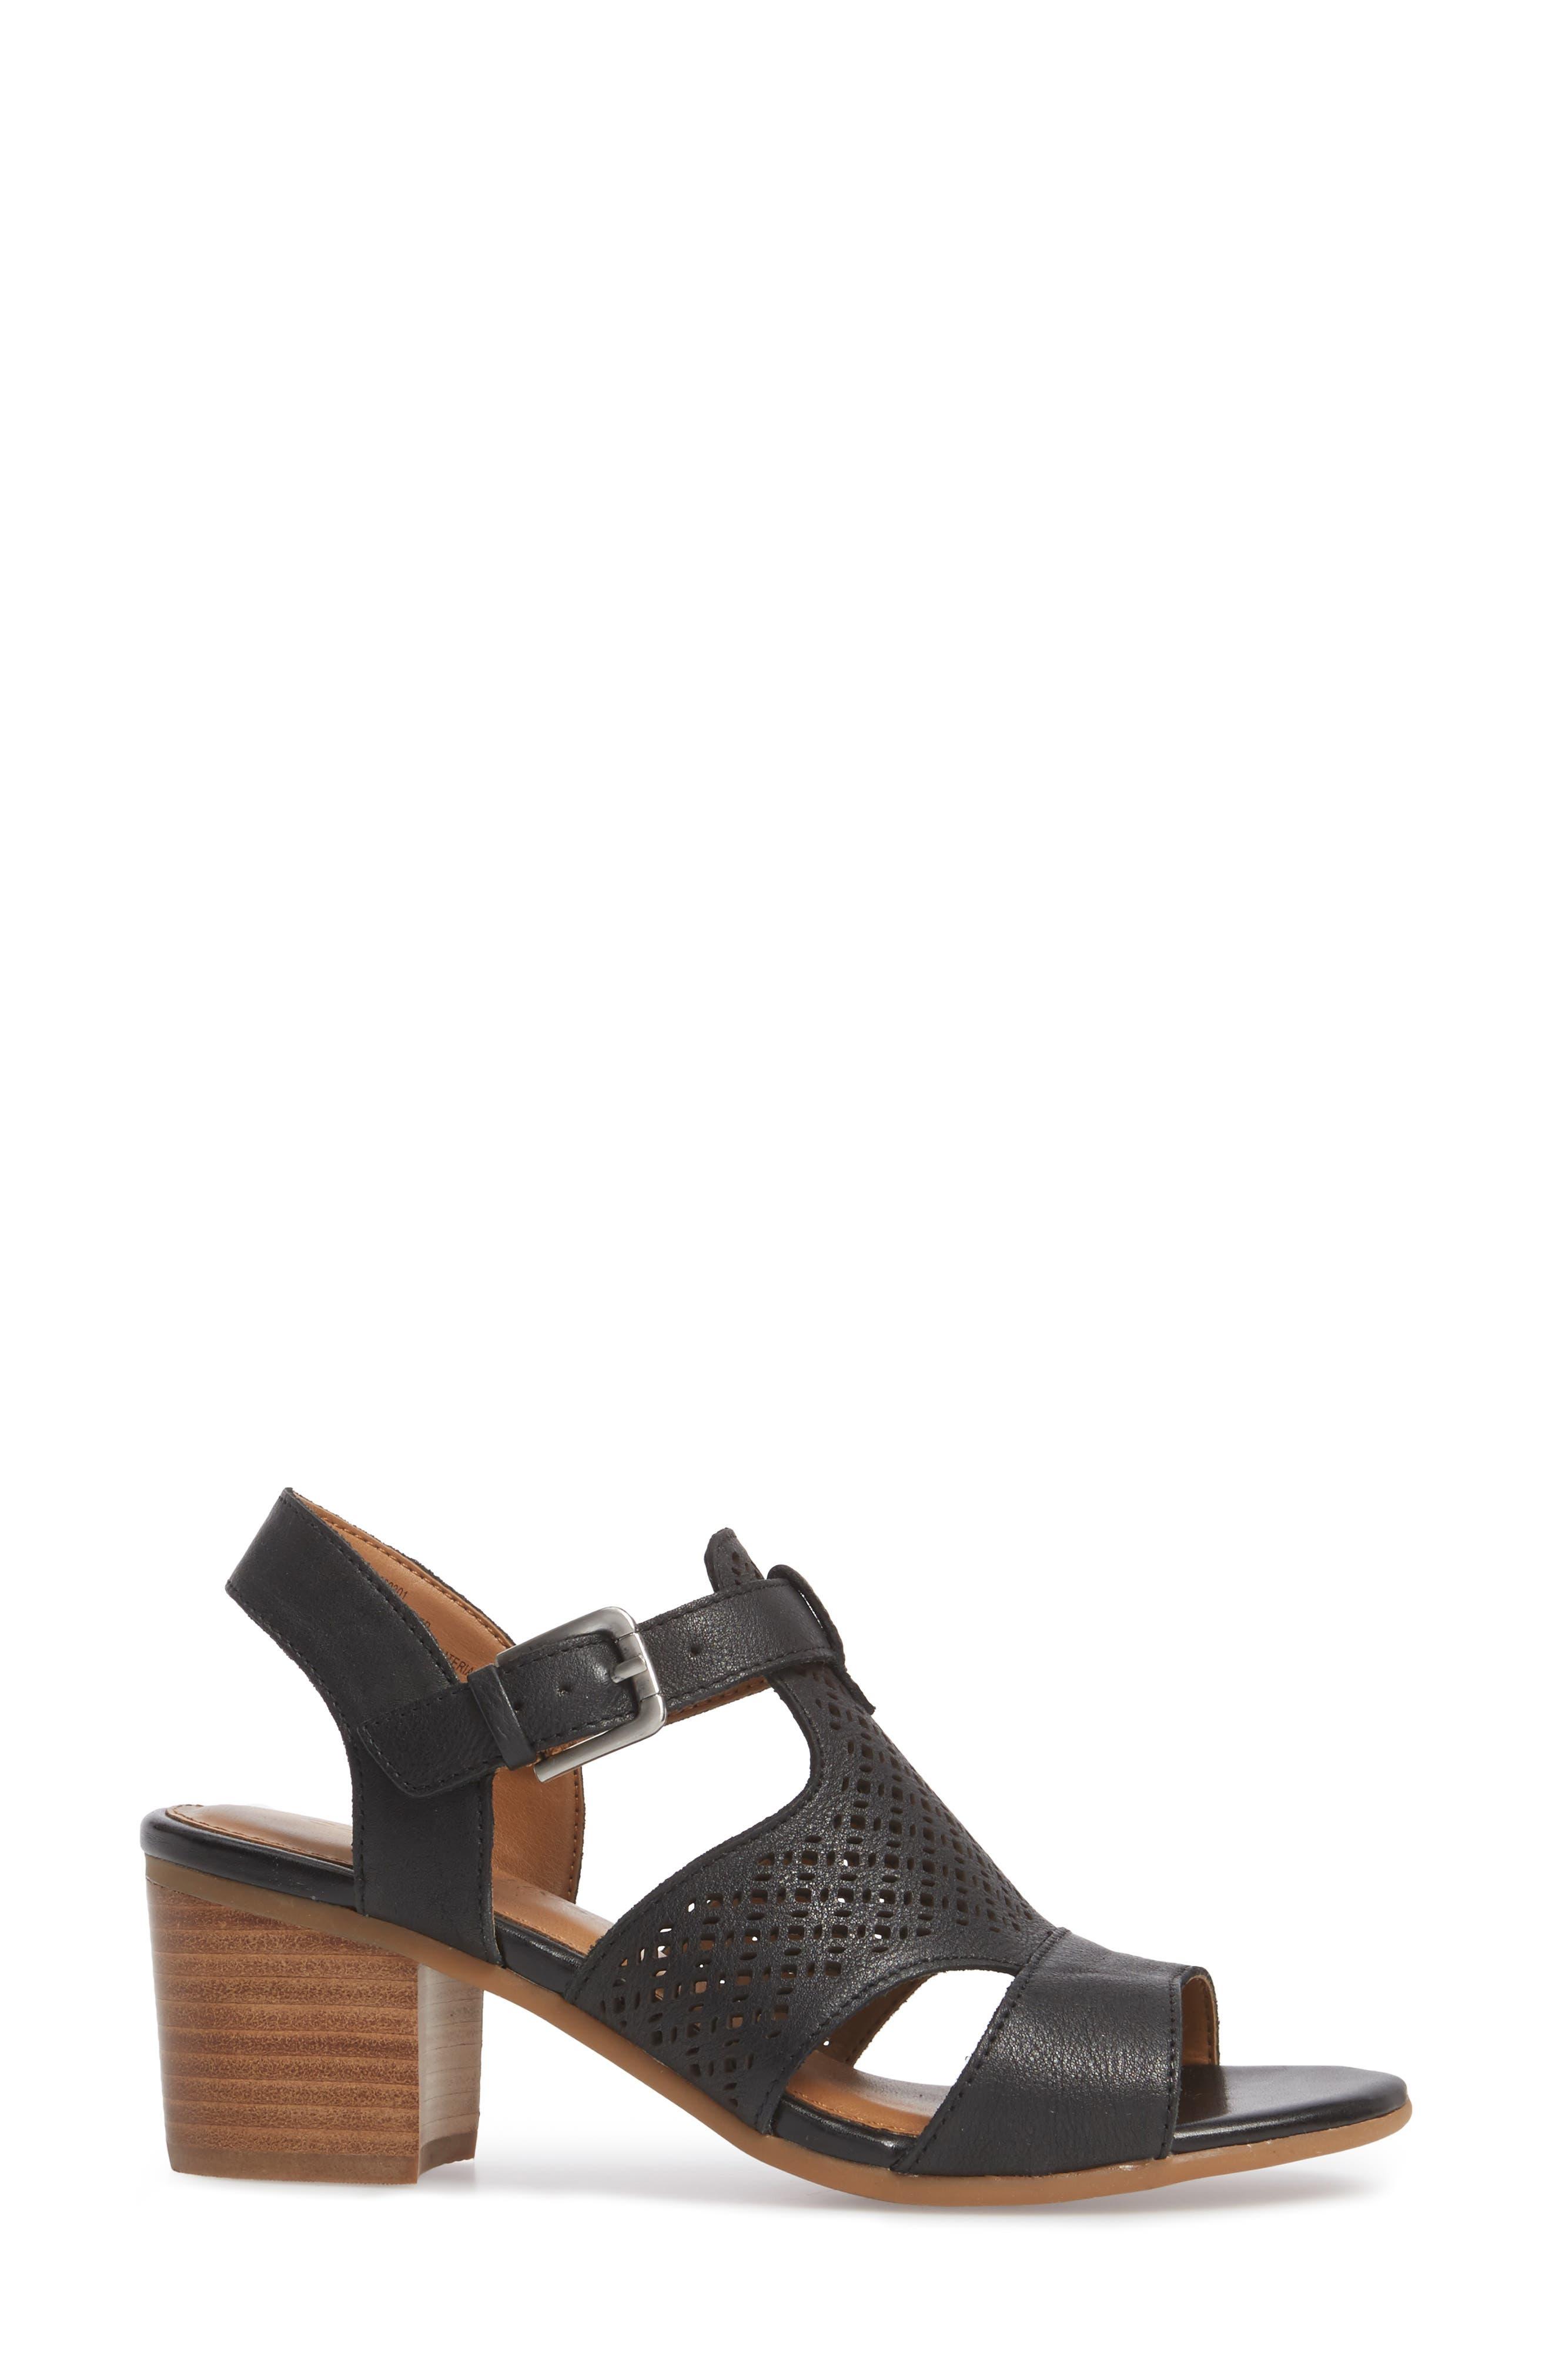 Alternate Image 3  - Comfortiva Amber Perforated Block Heel Sandal (Women)